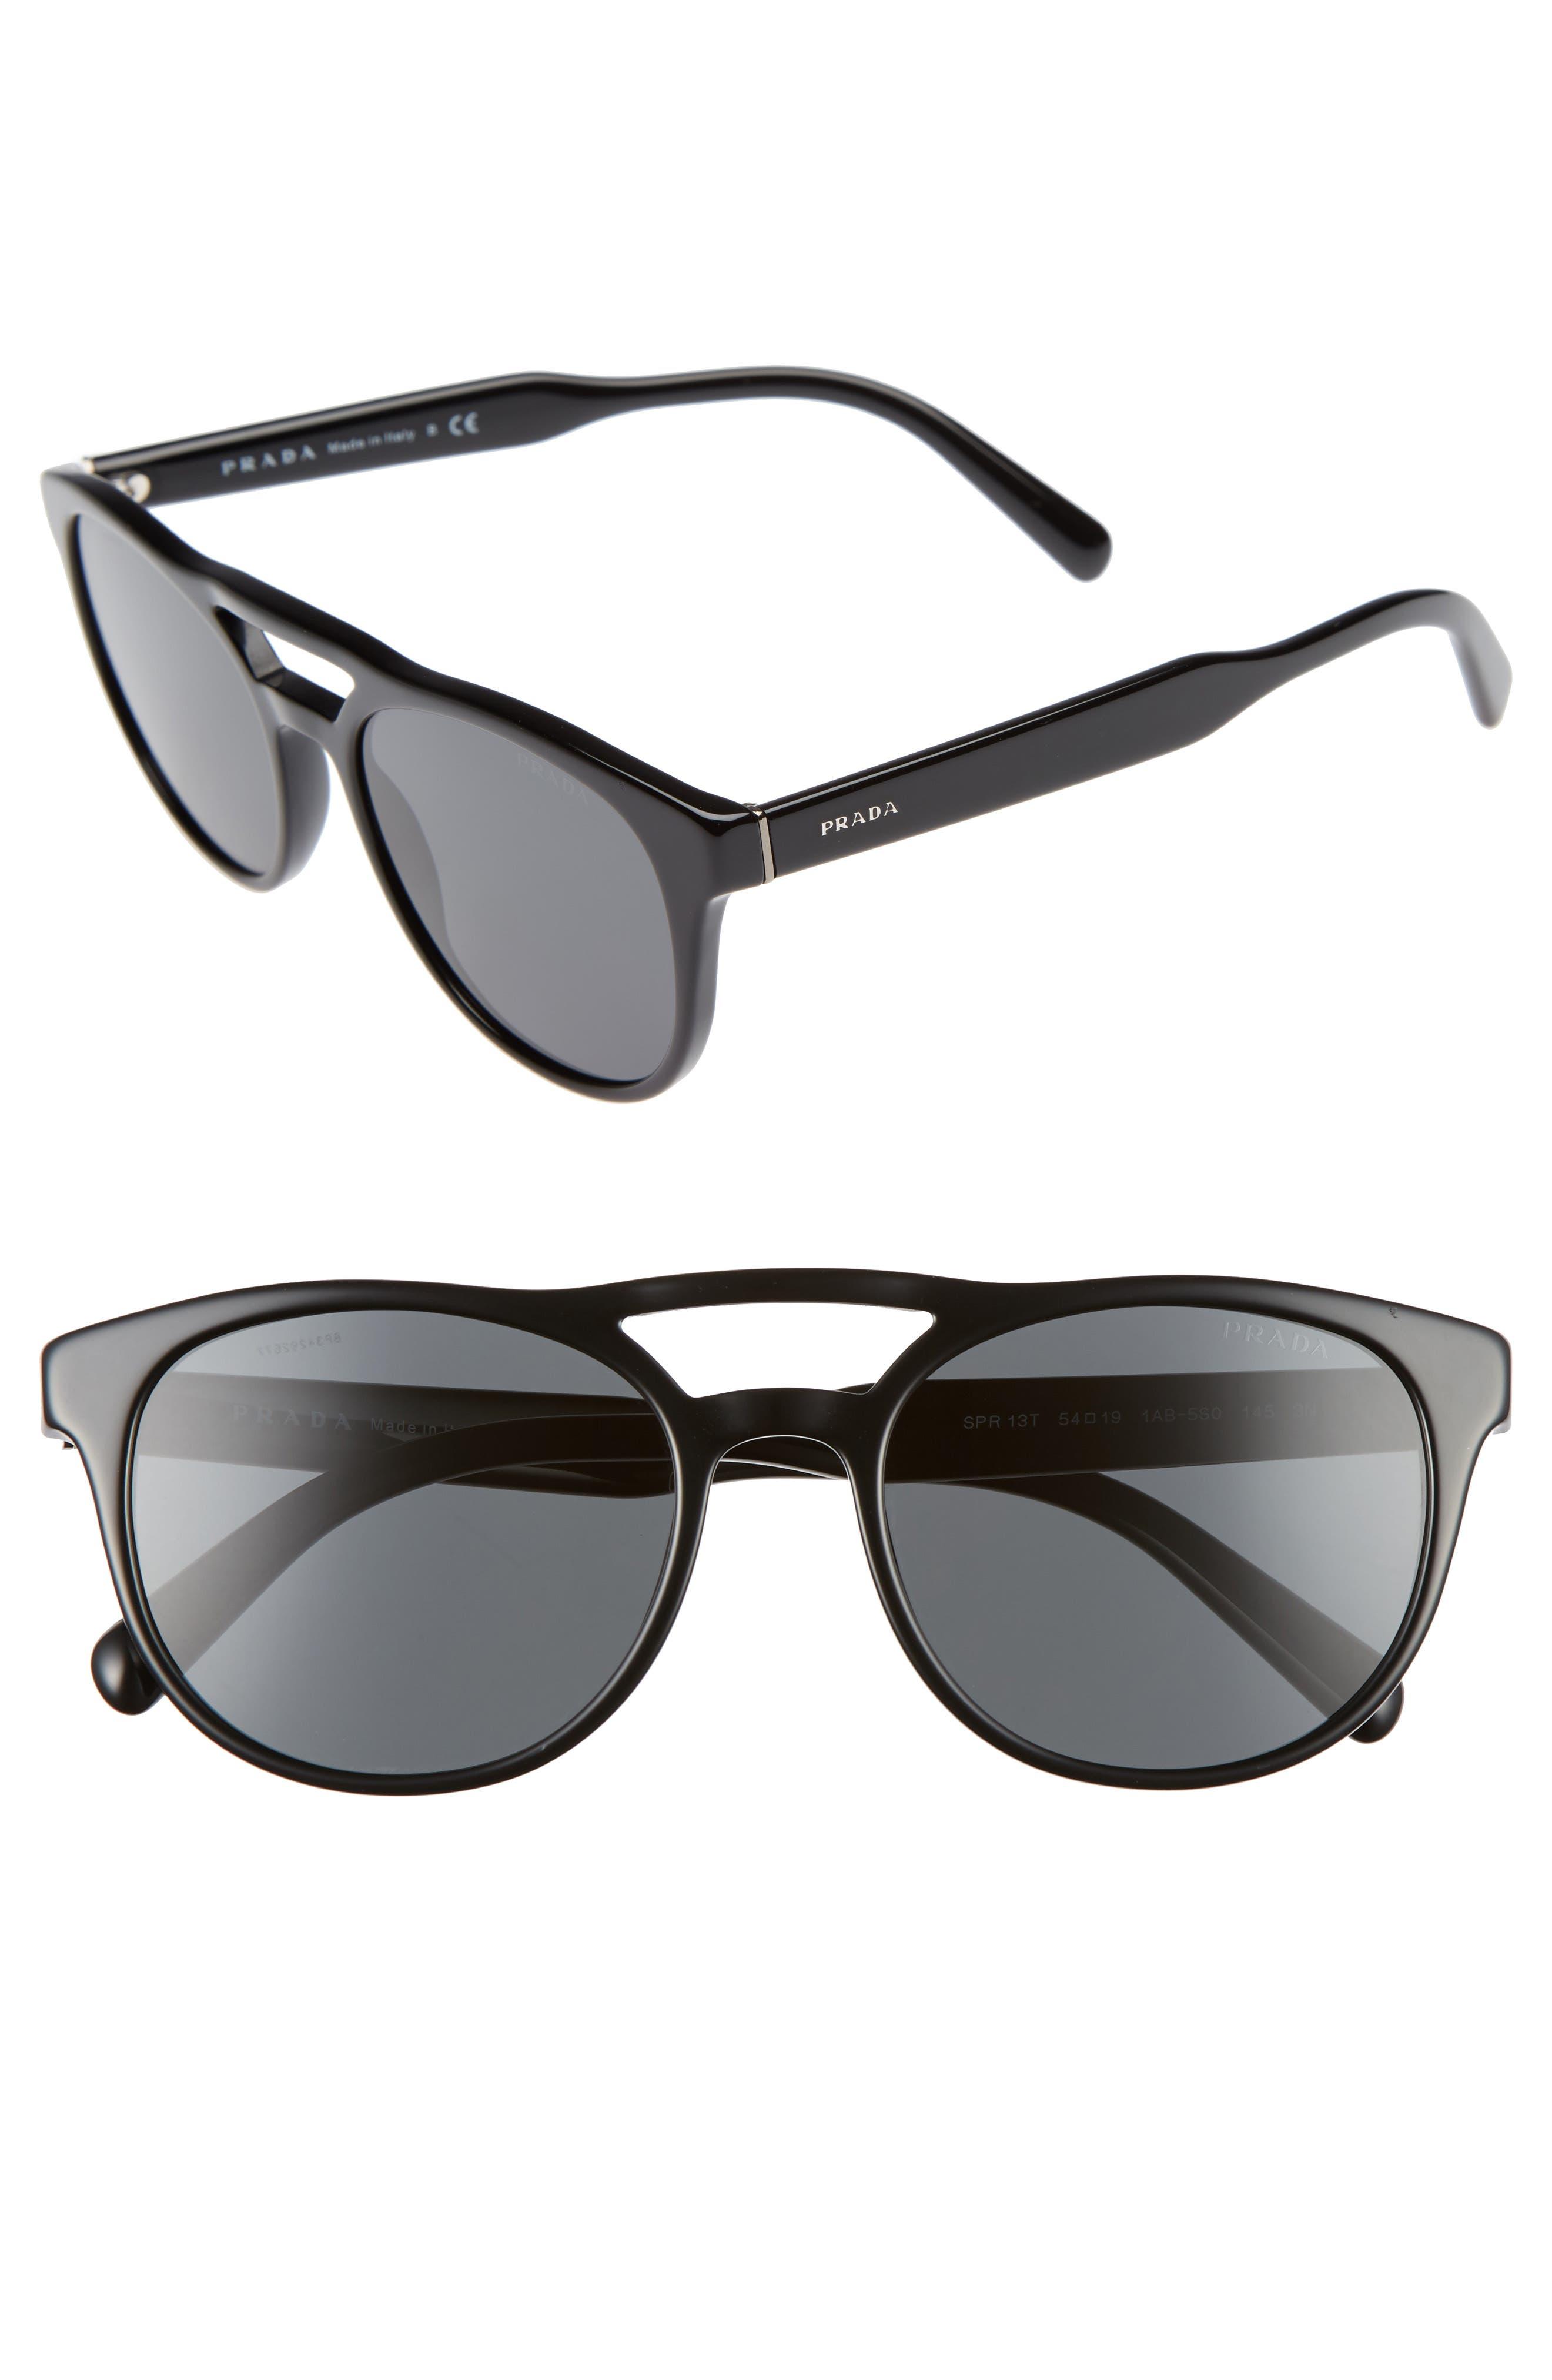 54mm Square Sunglasses,                             Main thumbnail 1, color,                             001